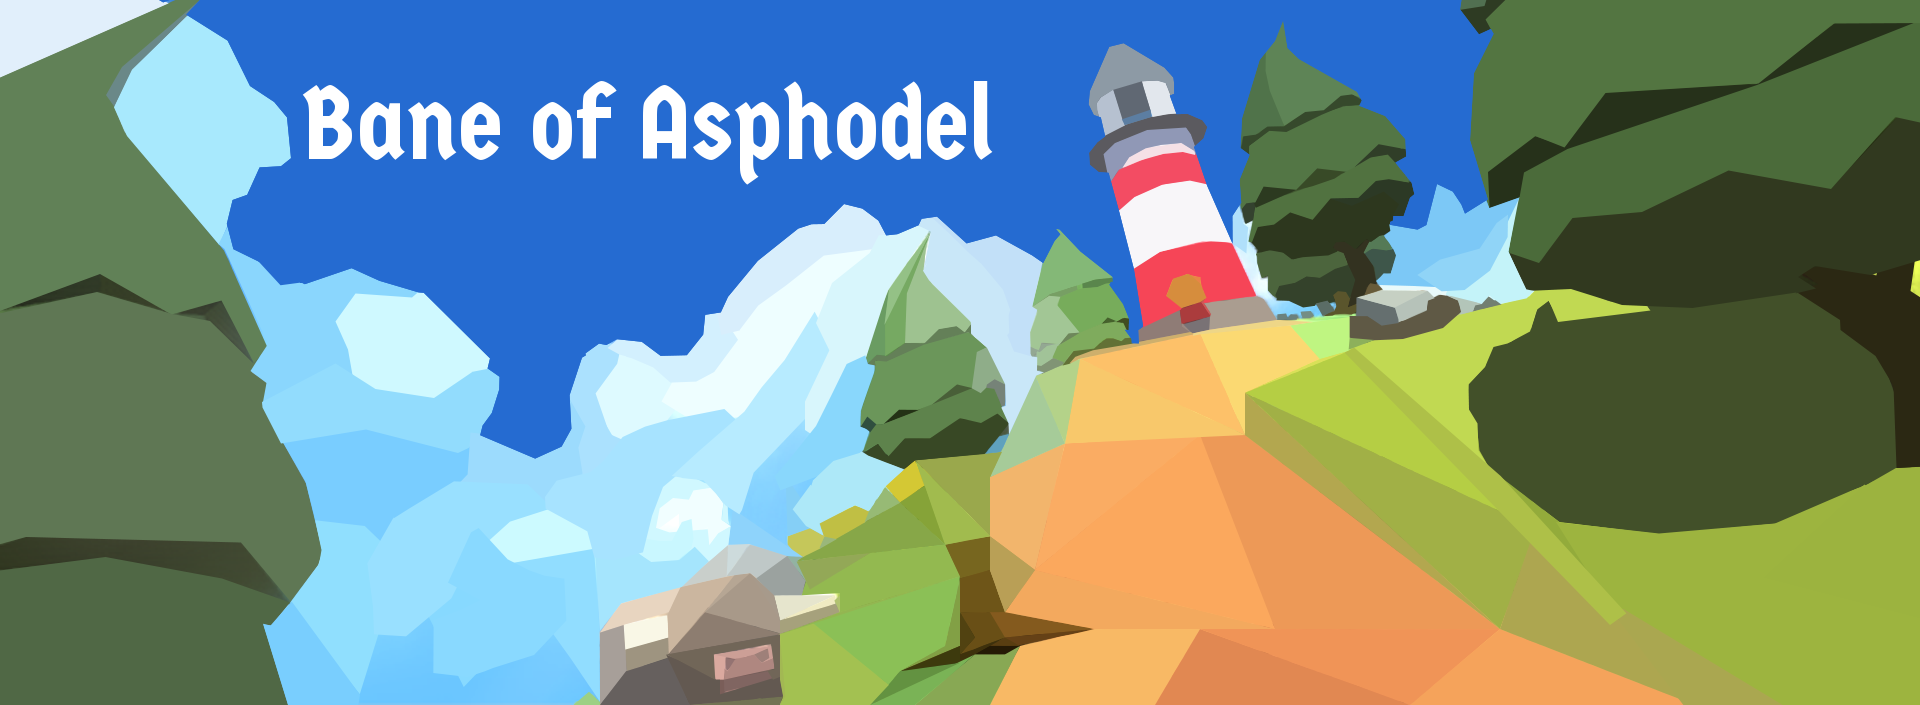 Bane Of Asphodel